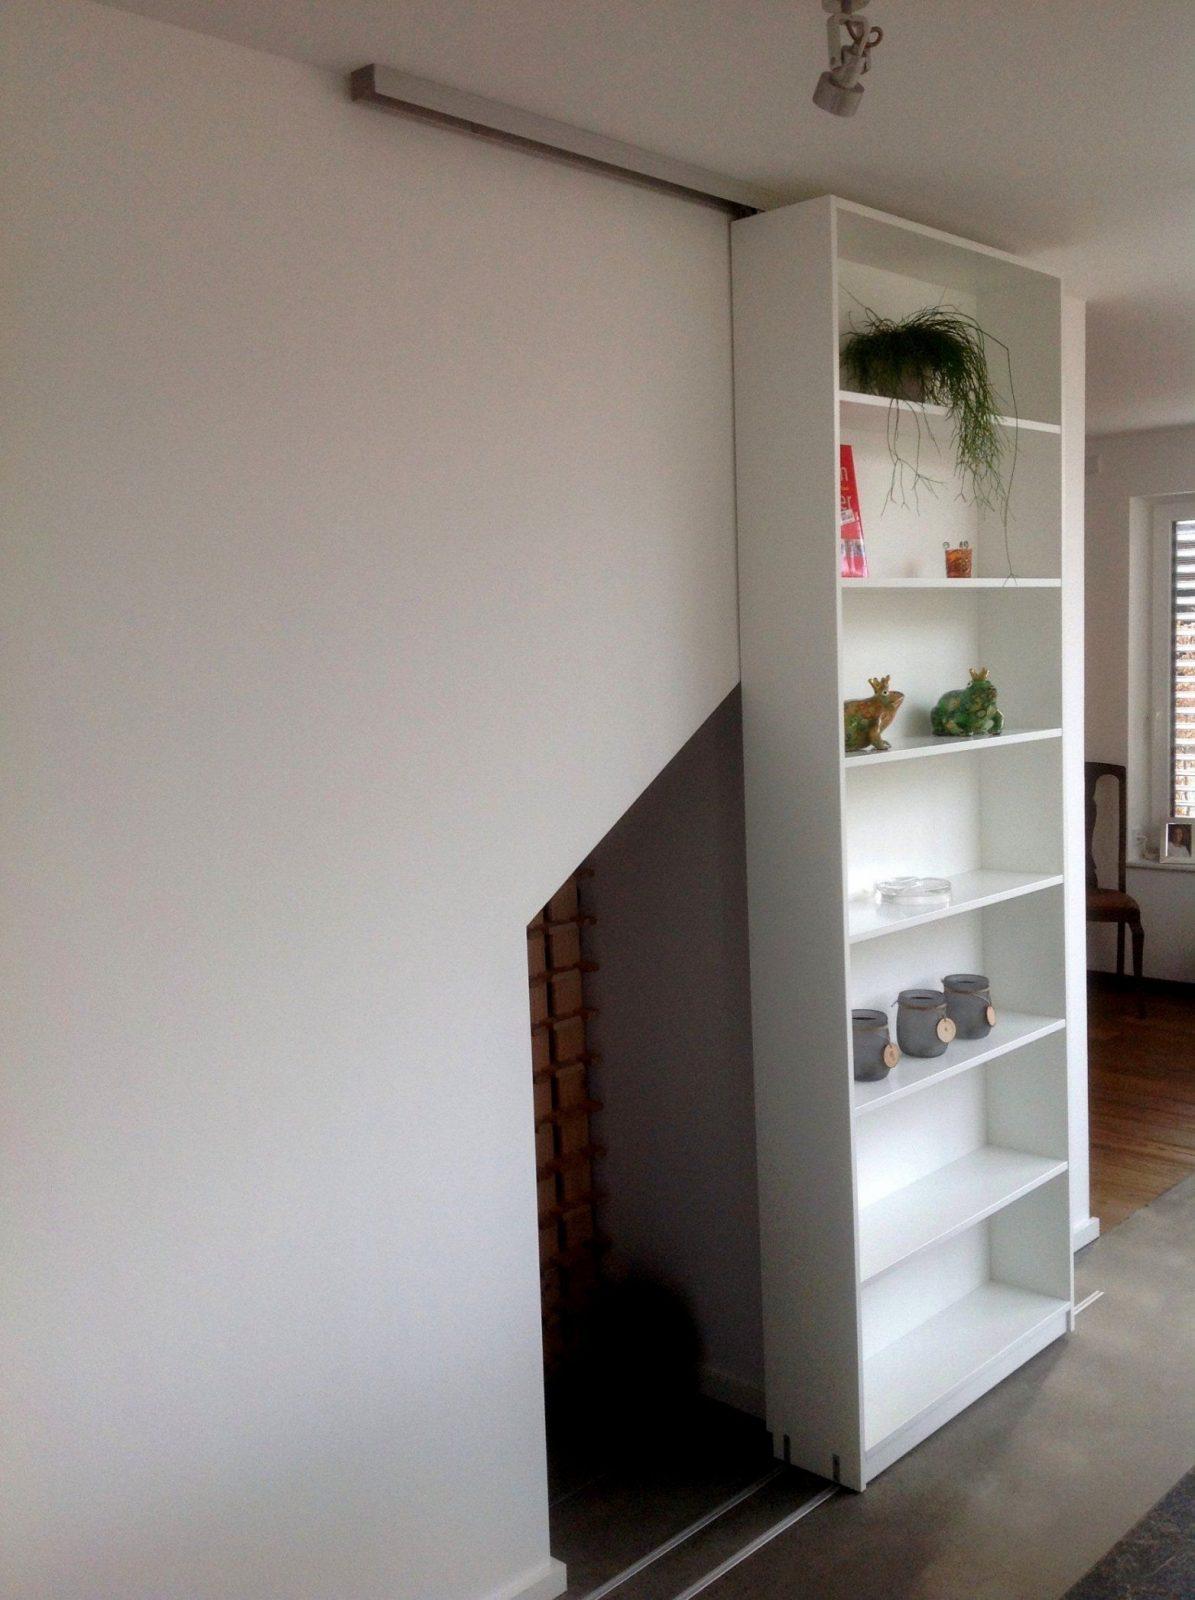 Interessant Raumteiler Selber Bauen Fachwerk